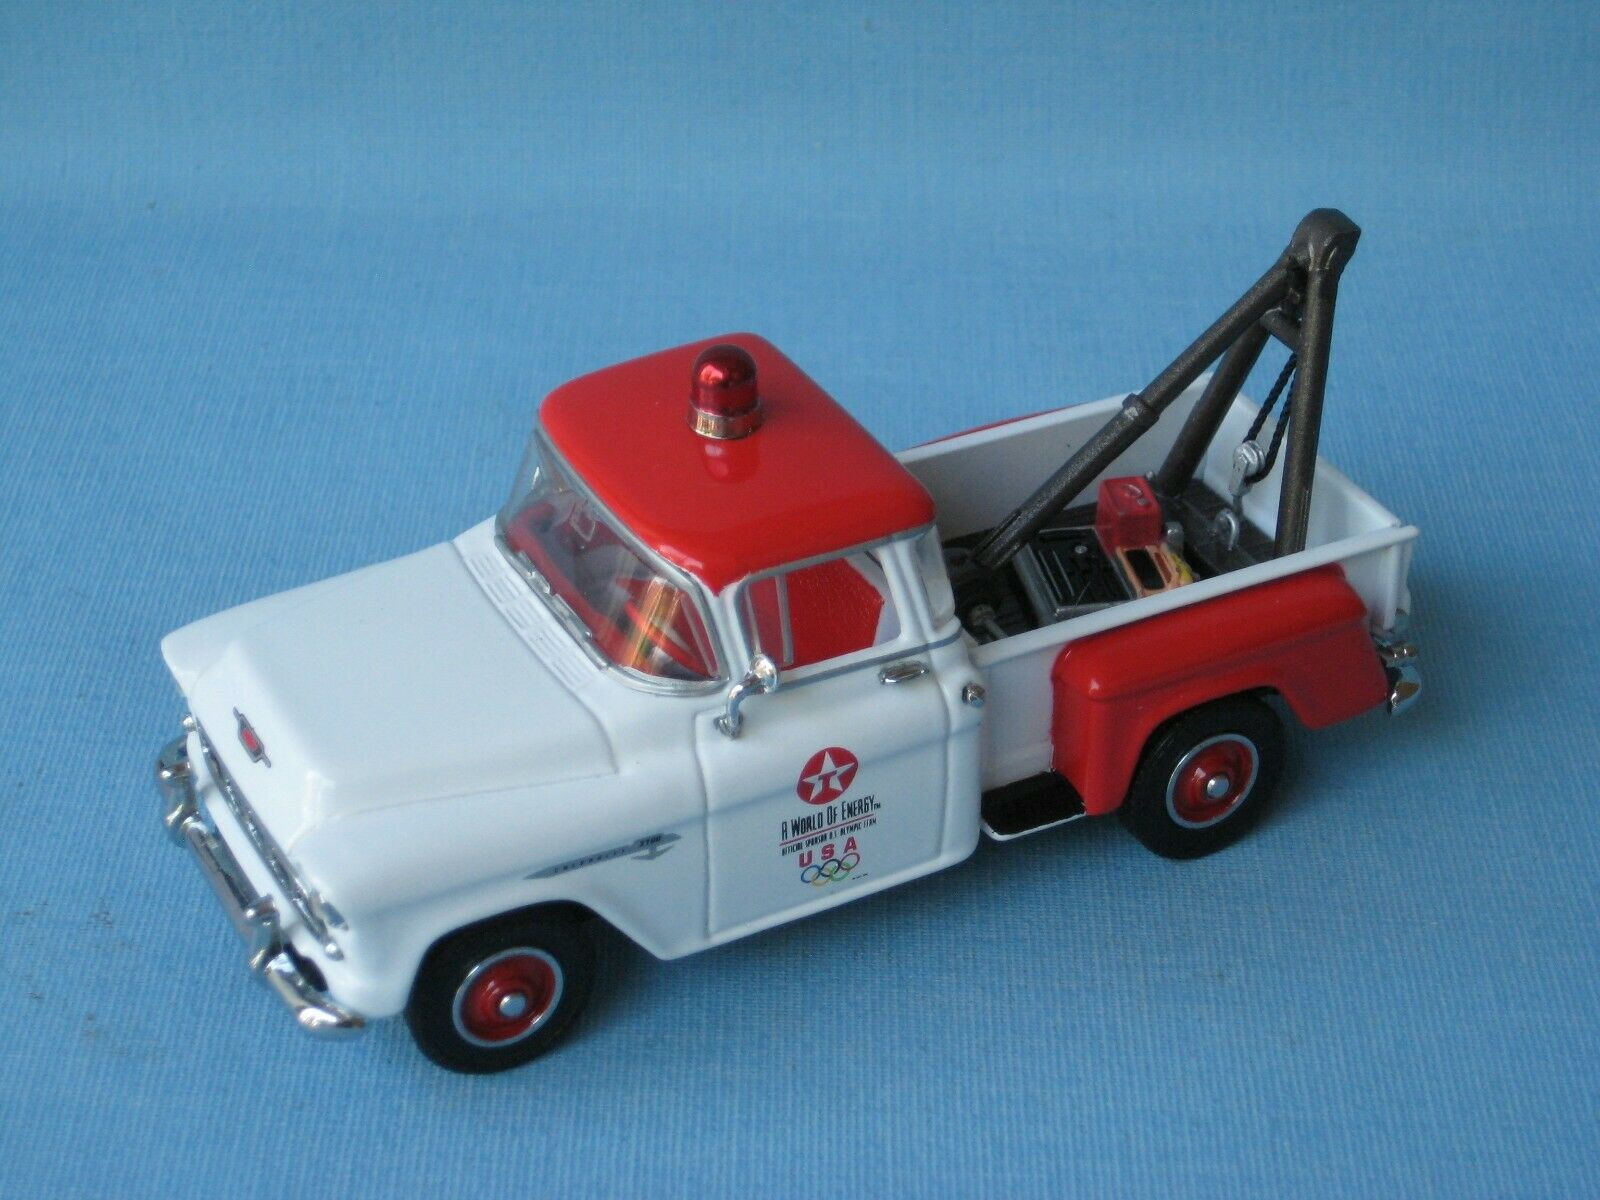 comprar marca Matchbox Yesteryear Yesteryear Yesteryear 1955 Chevrolet 3100 grúa Texaco olímpico Collectibles  descuento